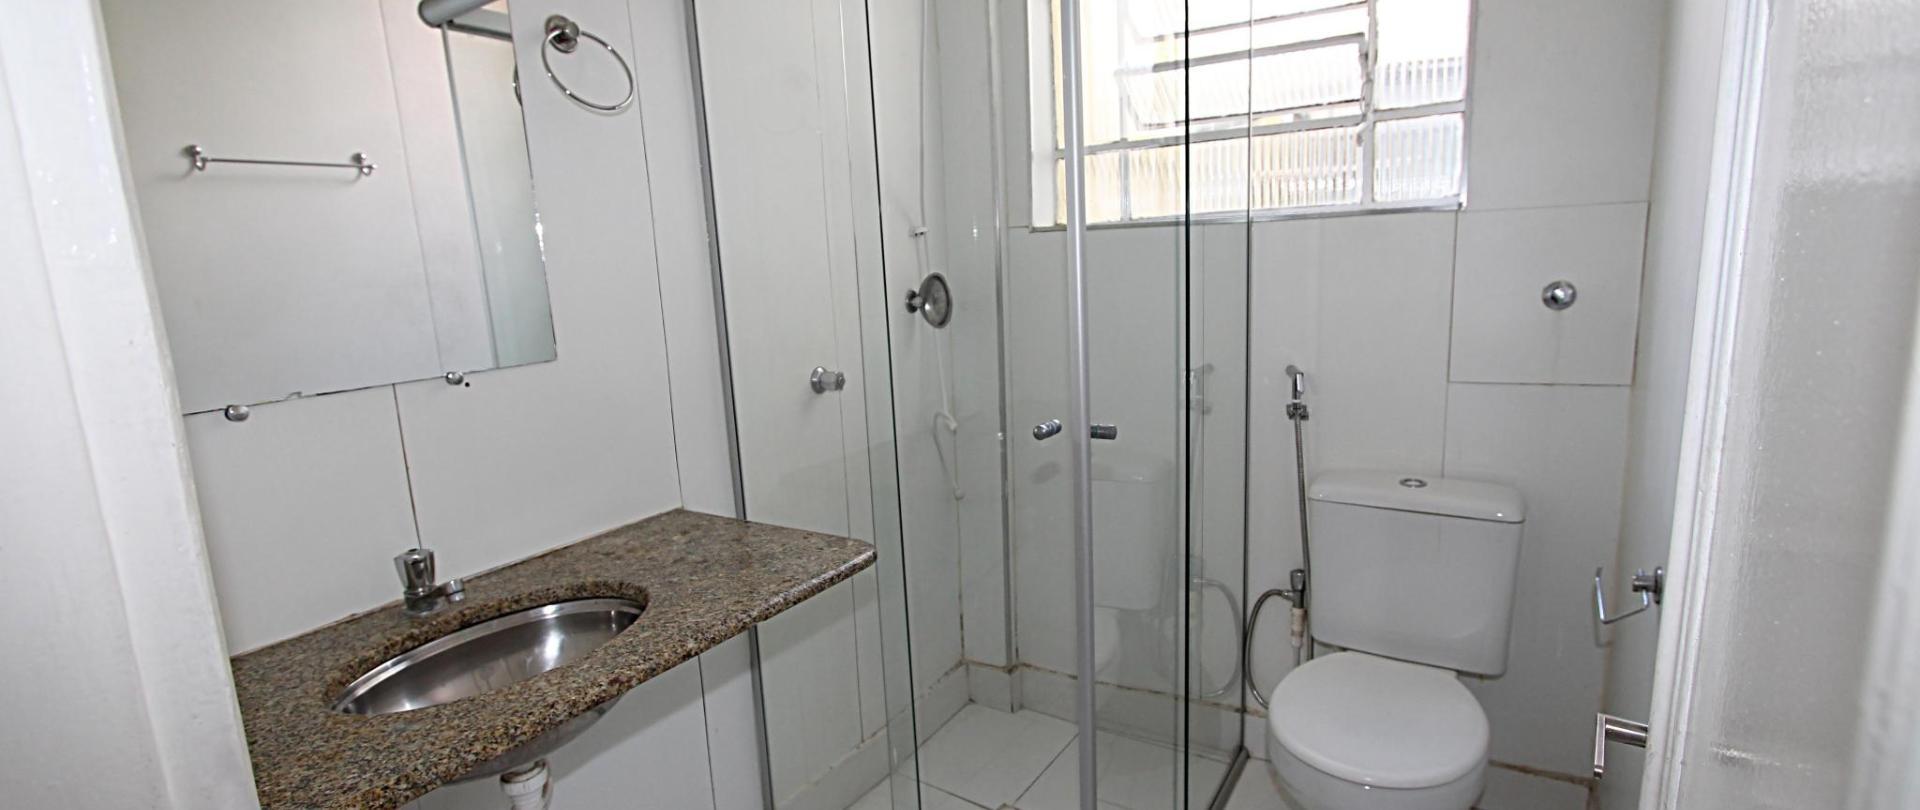 Foto - Banheiro.jpg